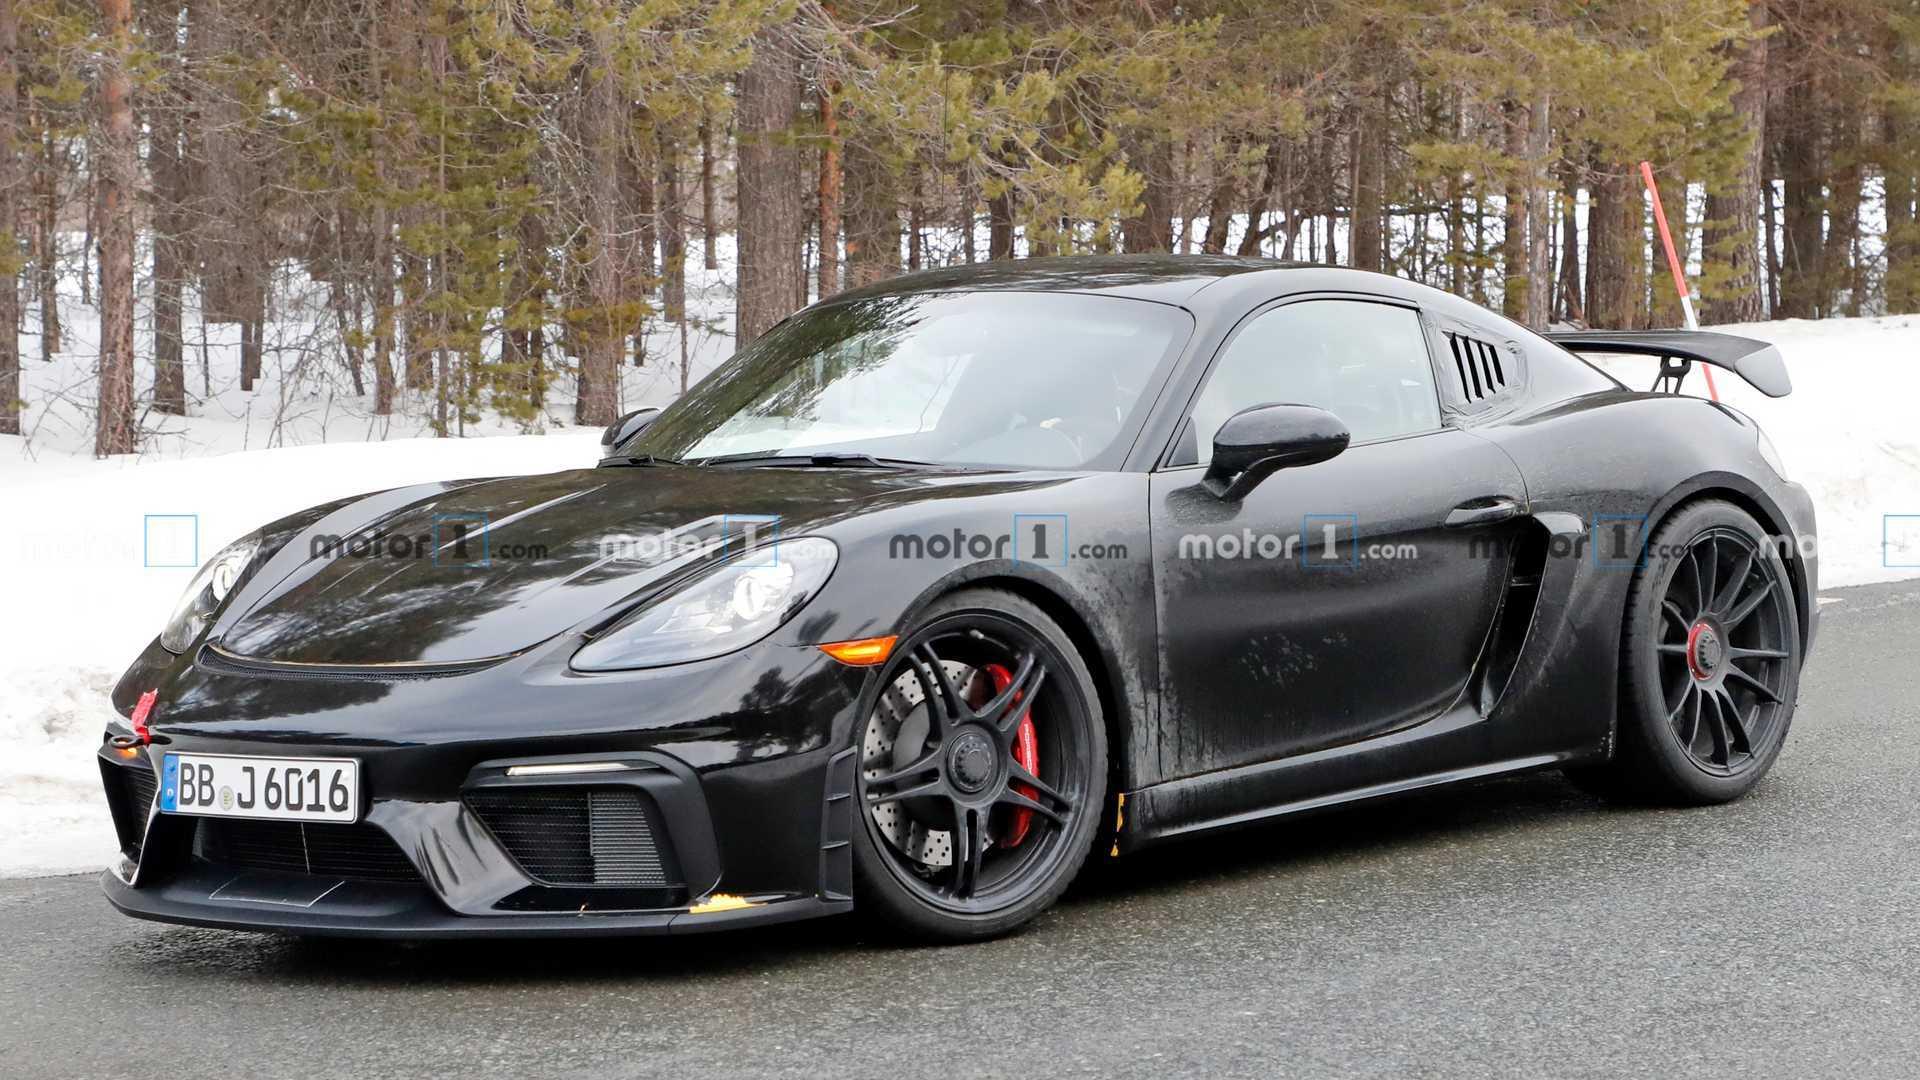 Porsche 718 Cayman Gt4 Rs Rumored To Pack 500 Horsepower